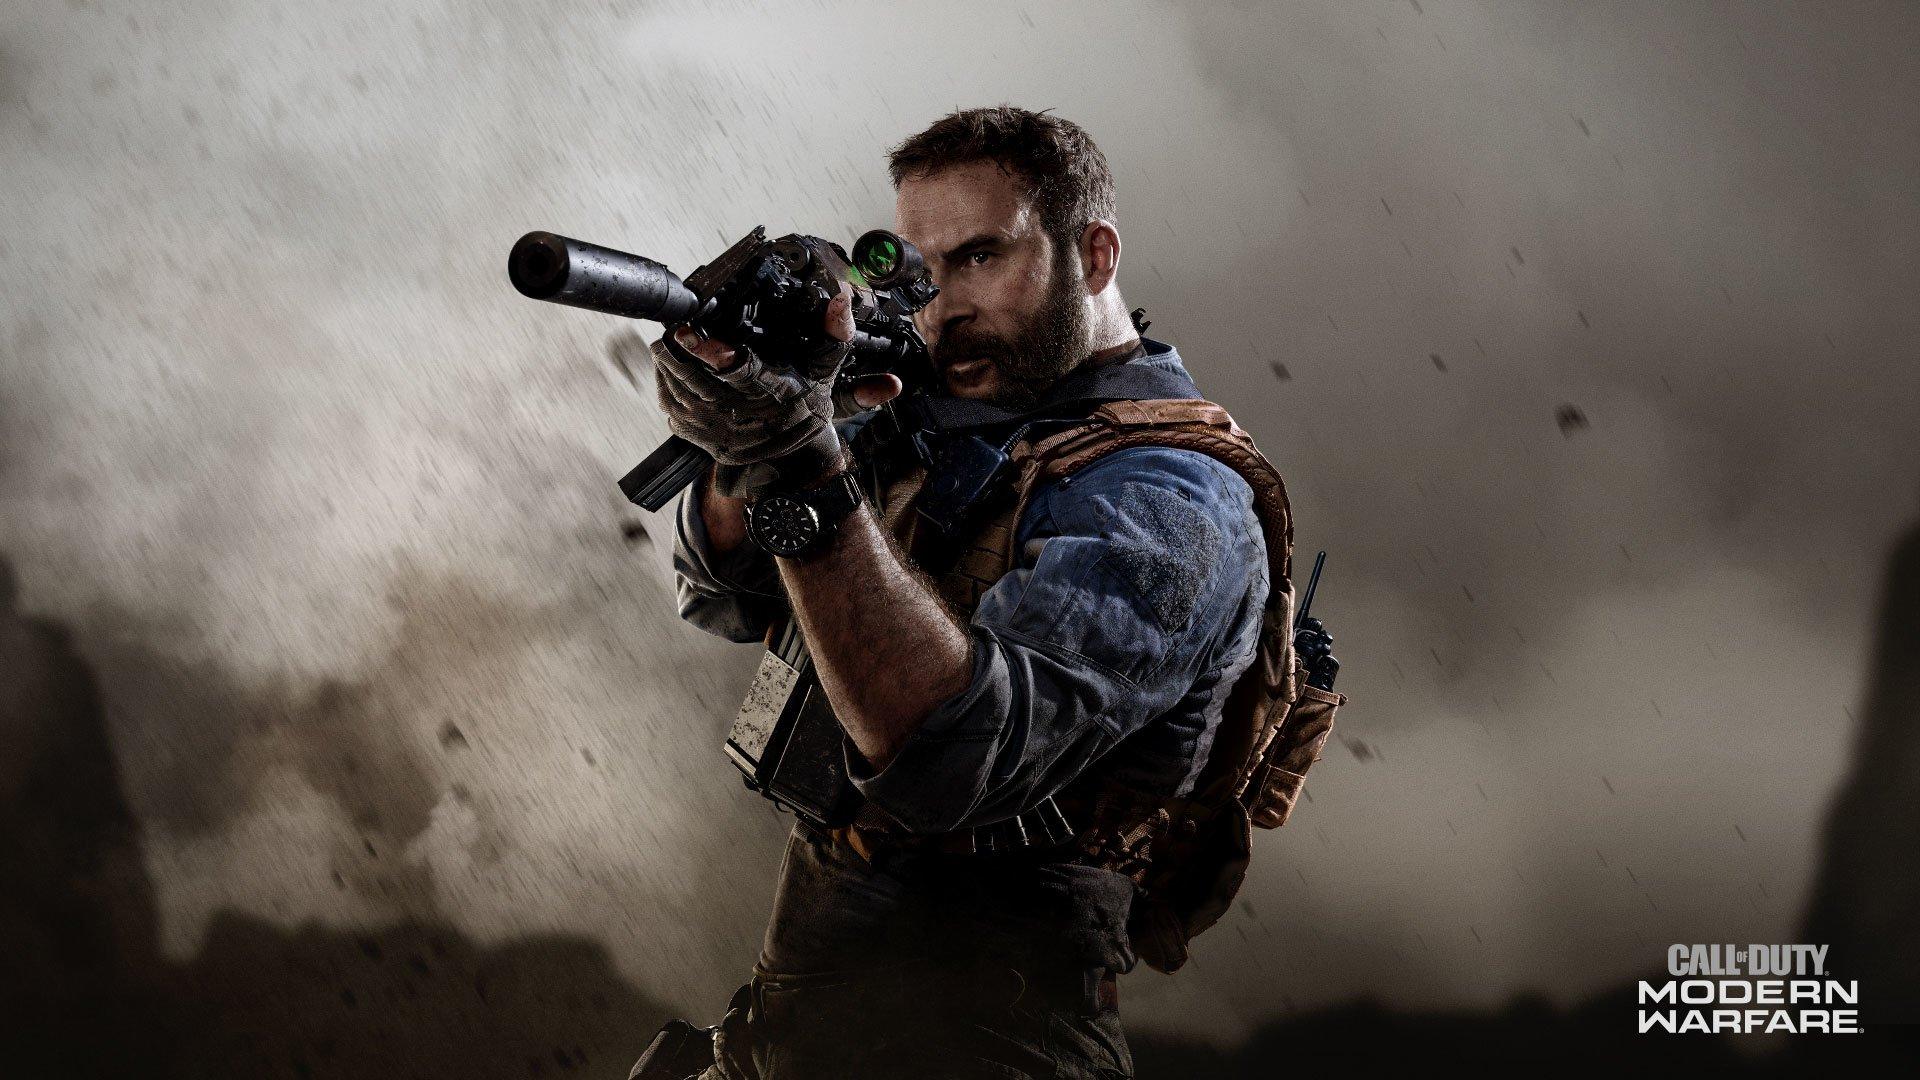 CoD Modern Warfare page wallpaper - Call of Duty: Modern Warfare